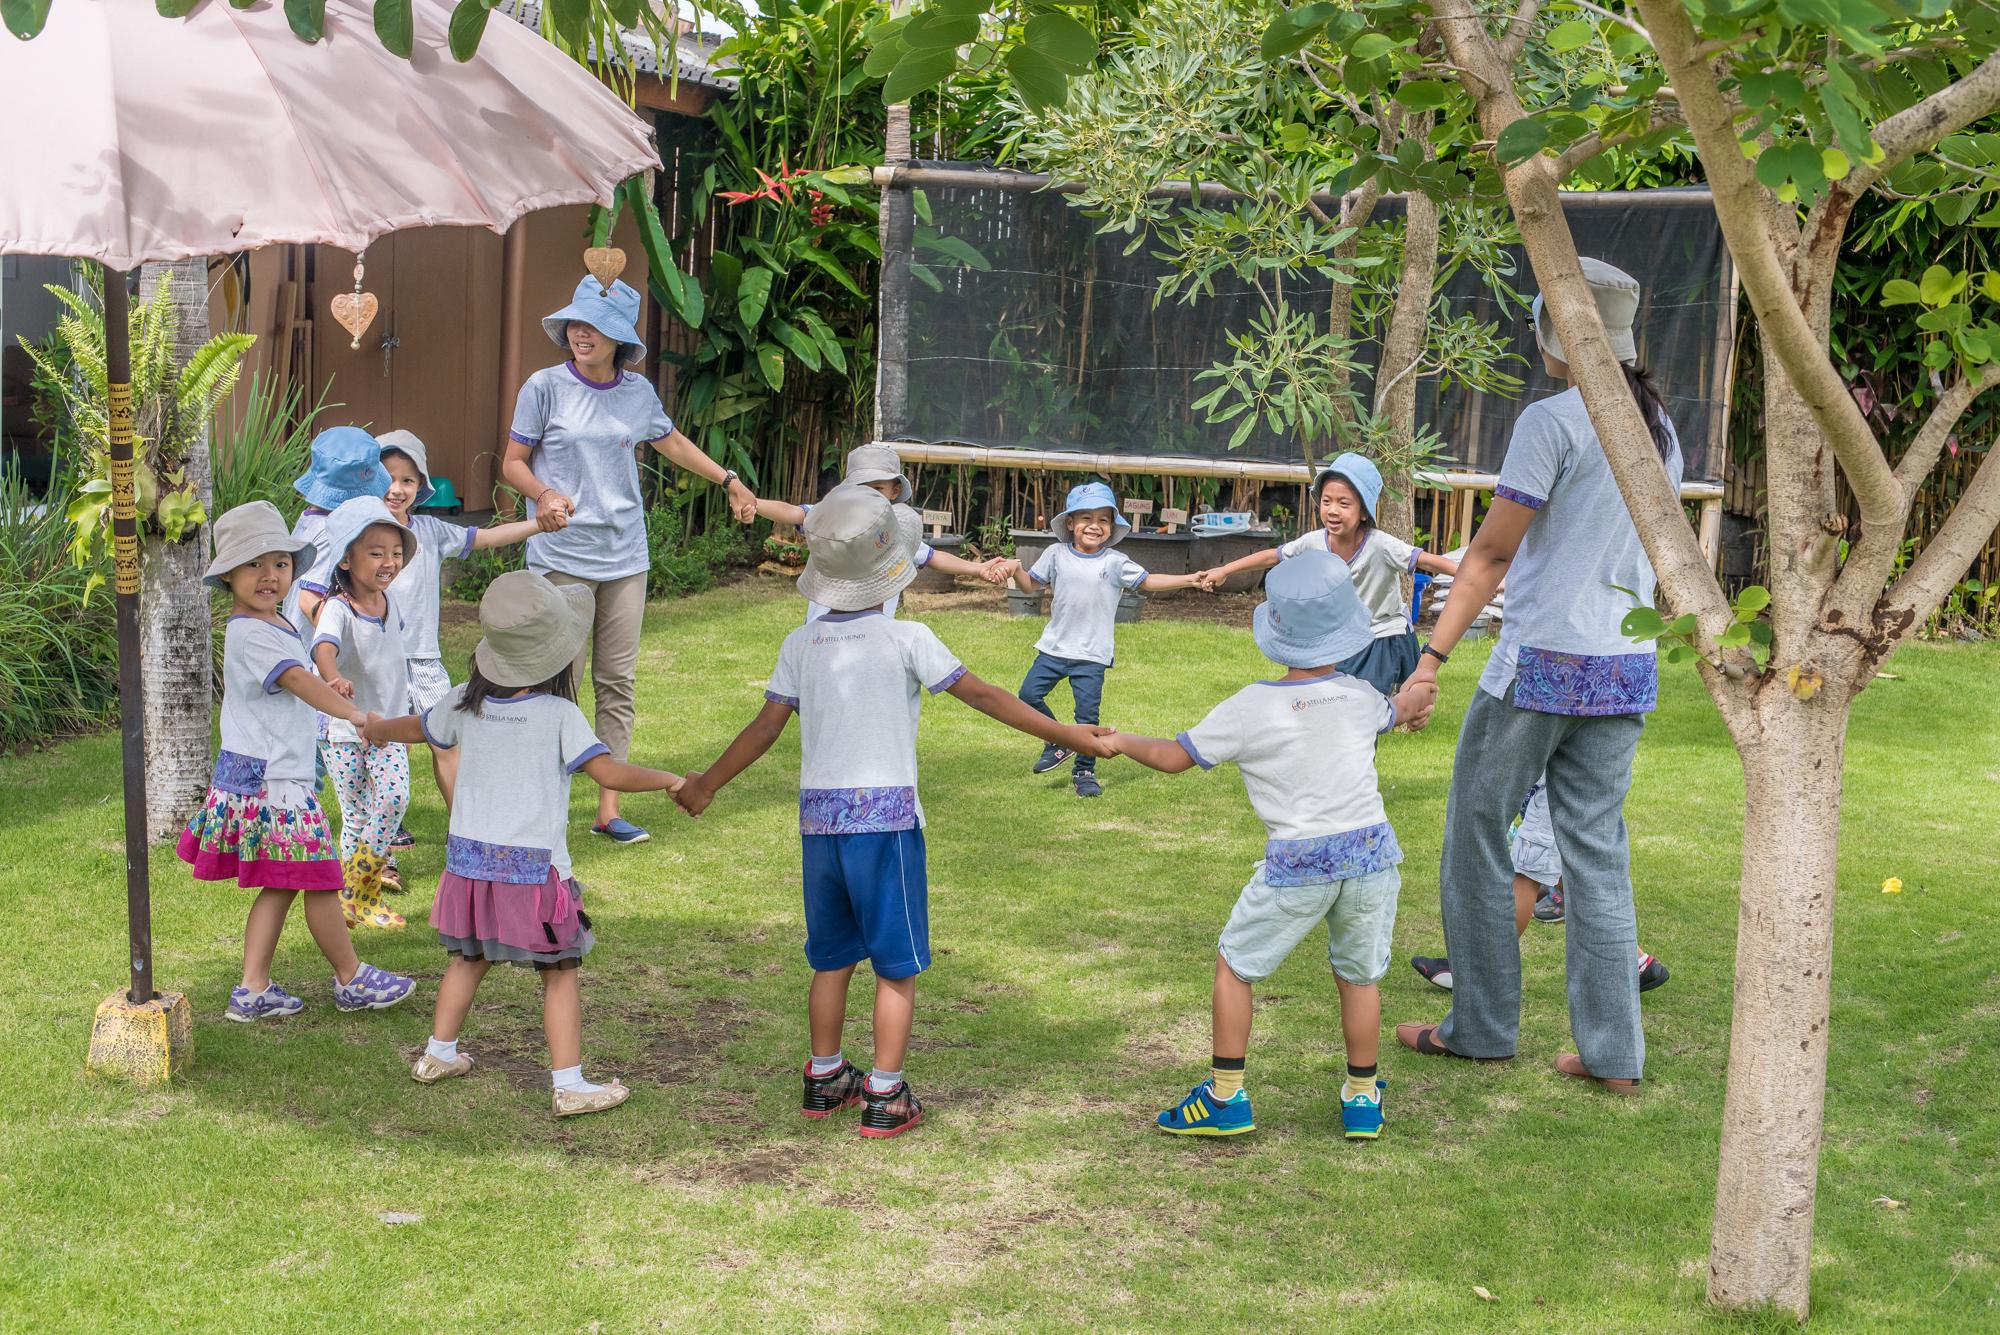 Sekolah Stella Mundi Sekolah Dasar Dan Taman Kanak Kanak